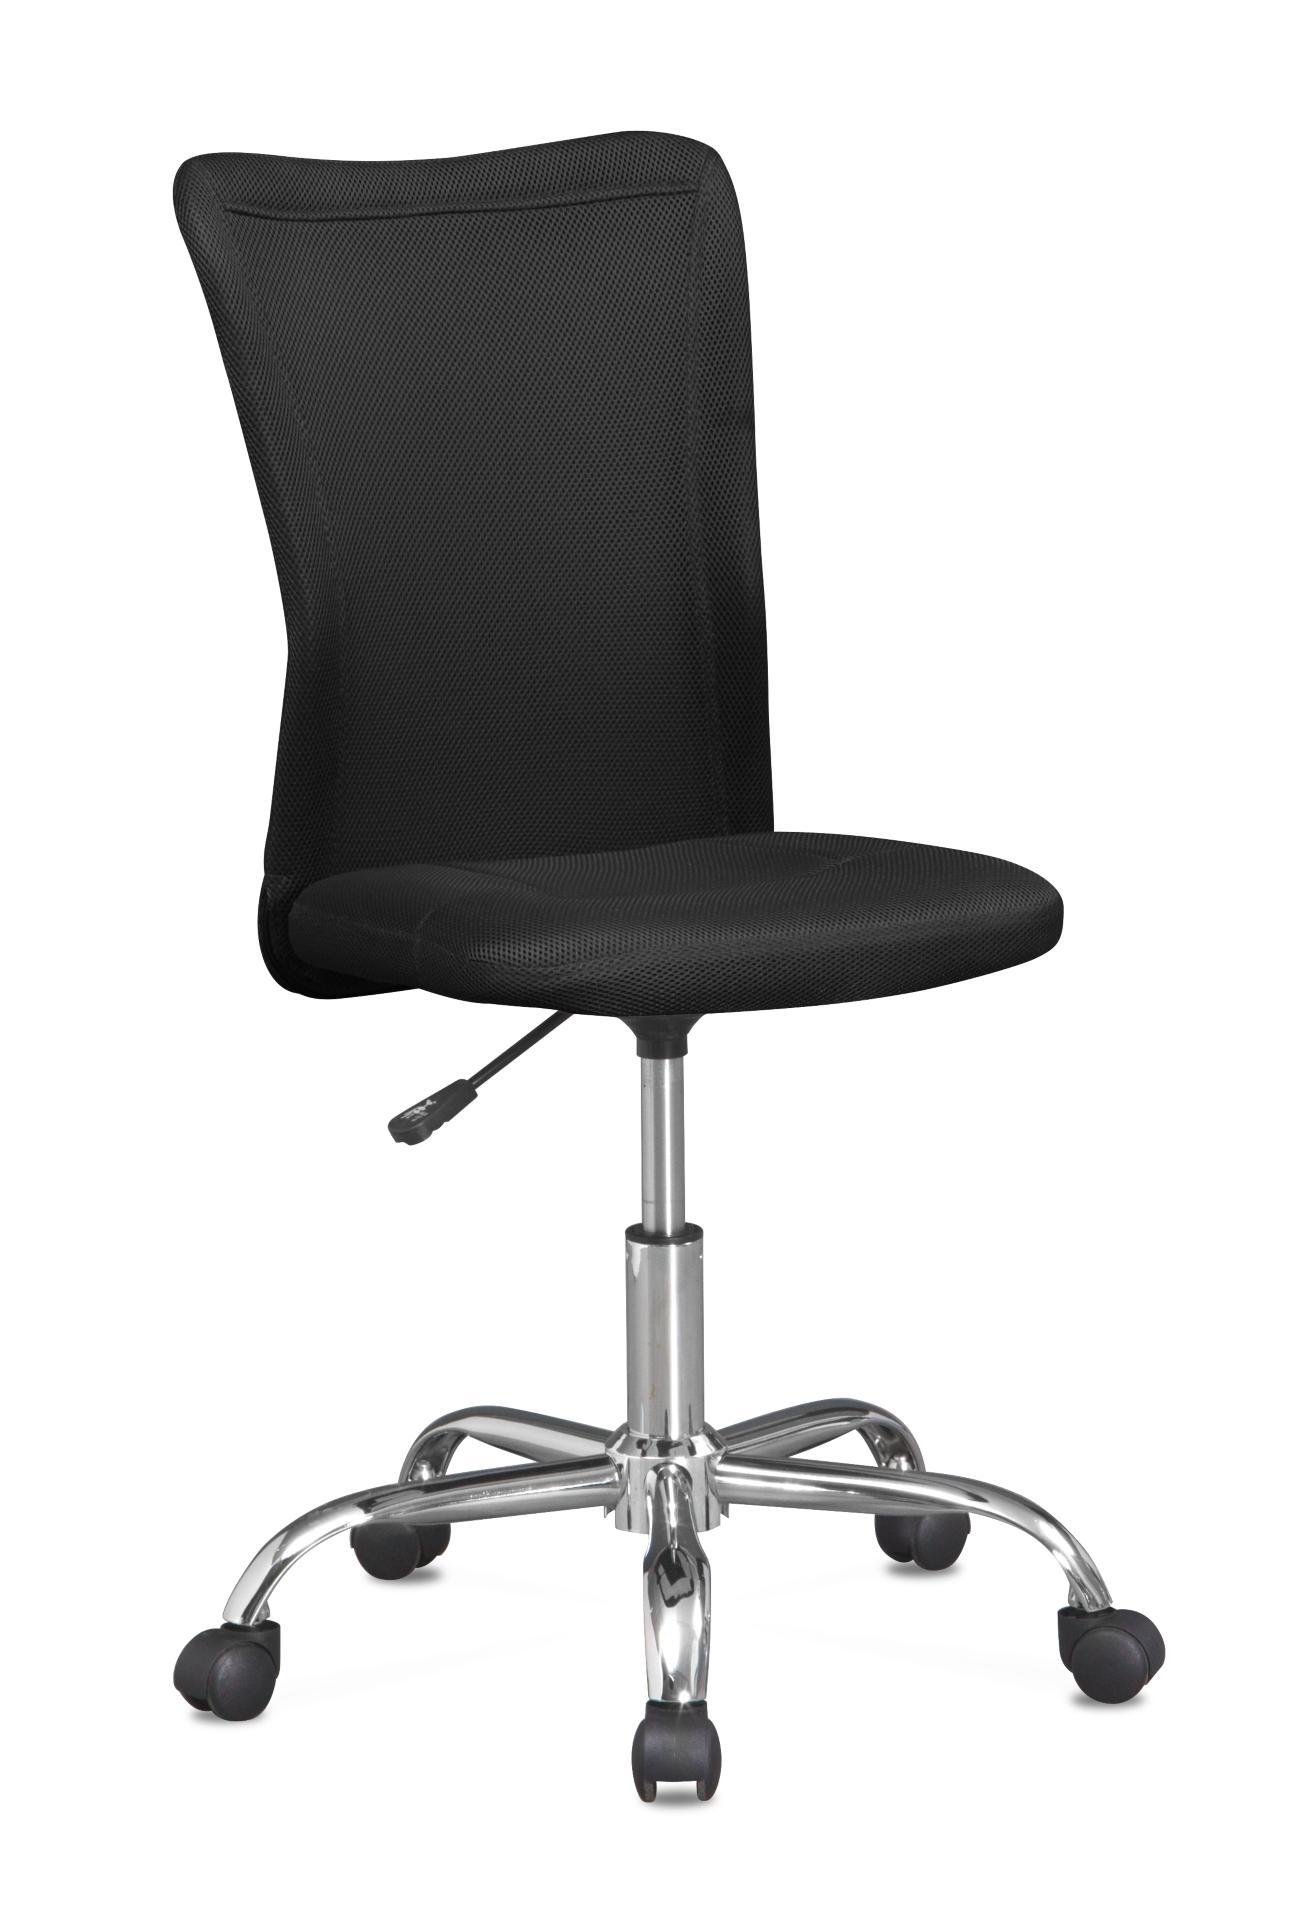 Mist Desk Chair   Black